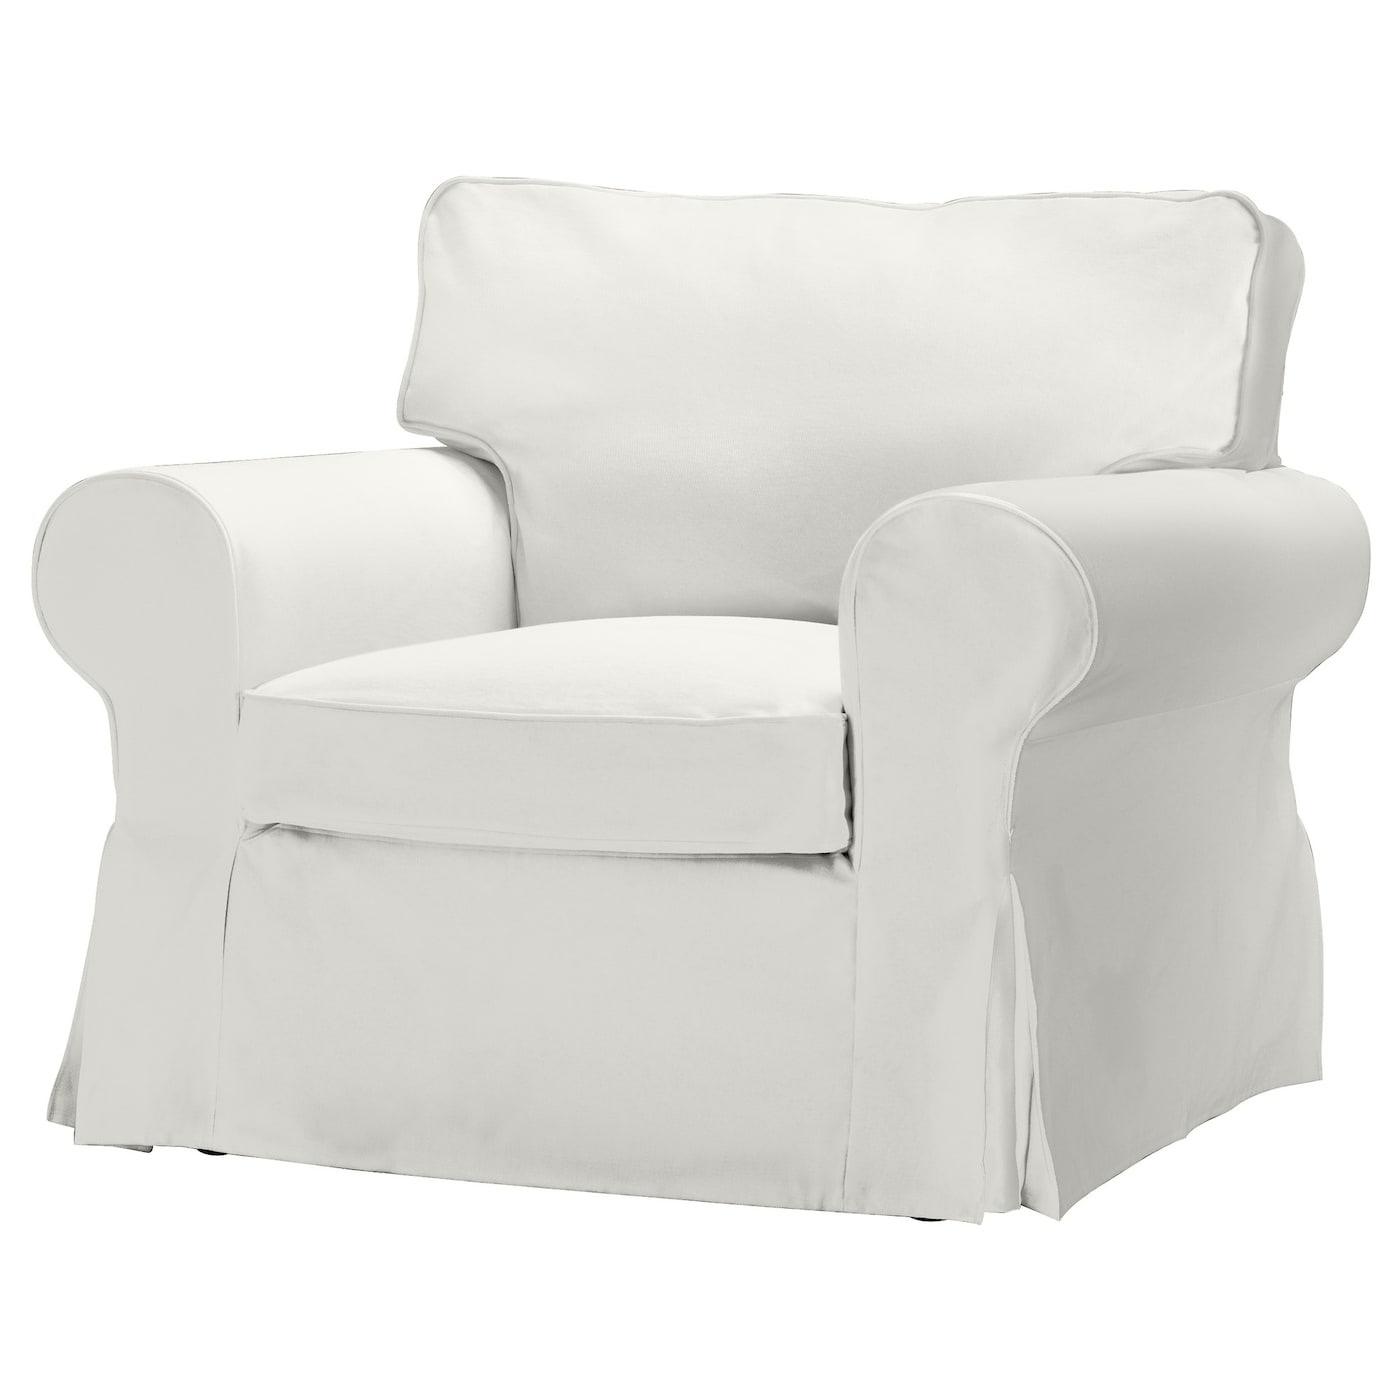 EKTORP Armchair cover Blekinge white - IKEA